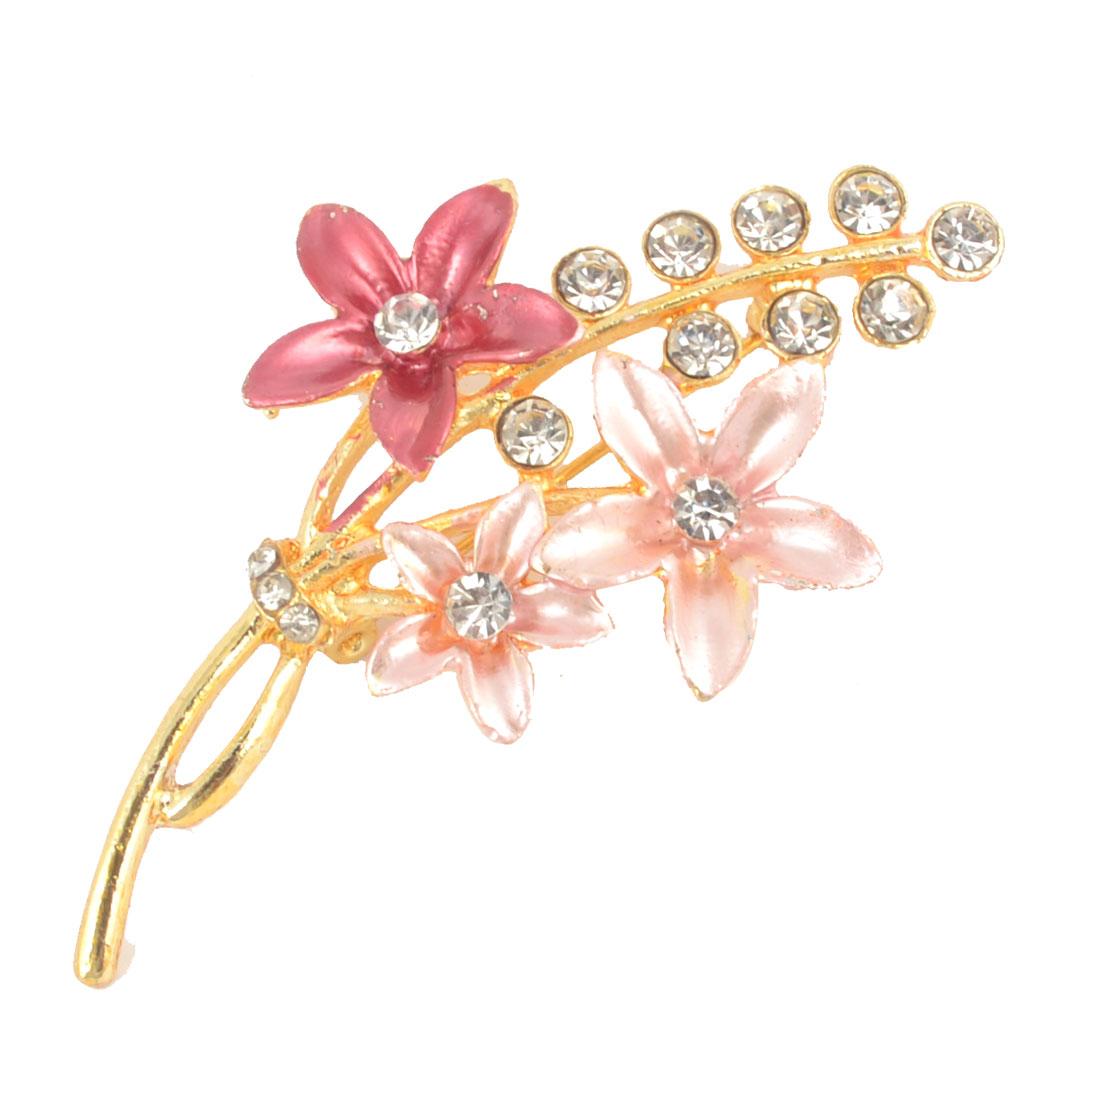 Ladies Glitter Rhinestone Inlaid Flower Decor Safety Pin Brooch Pink